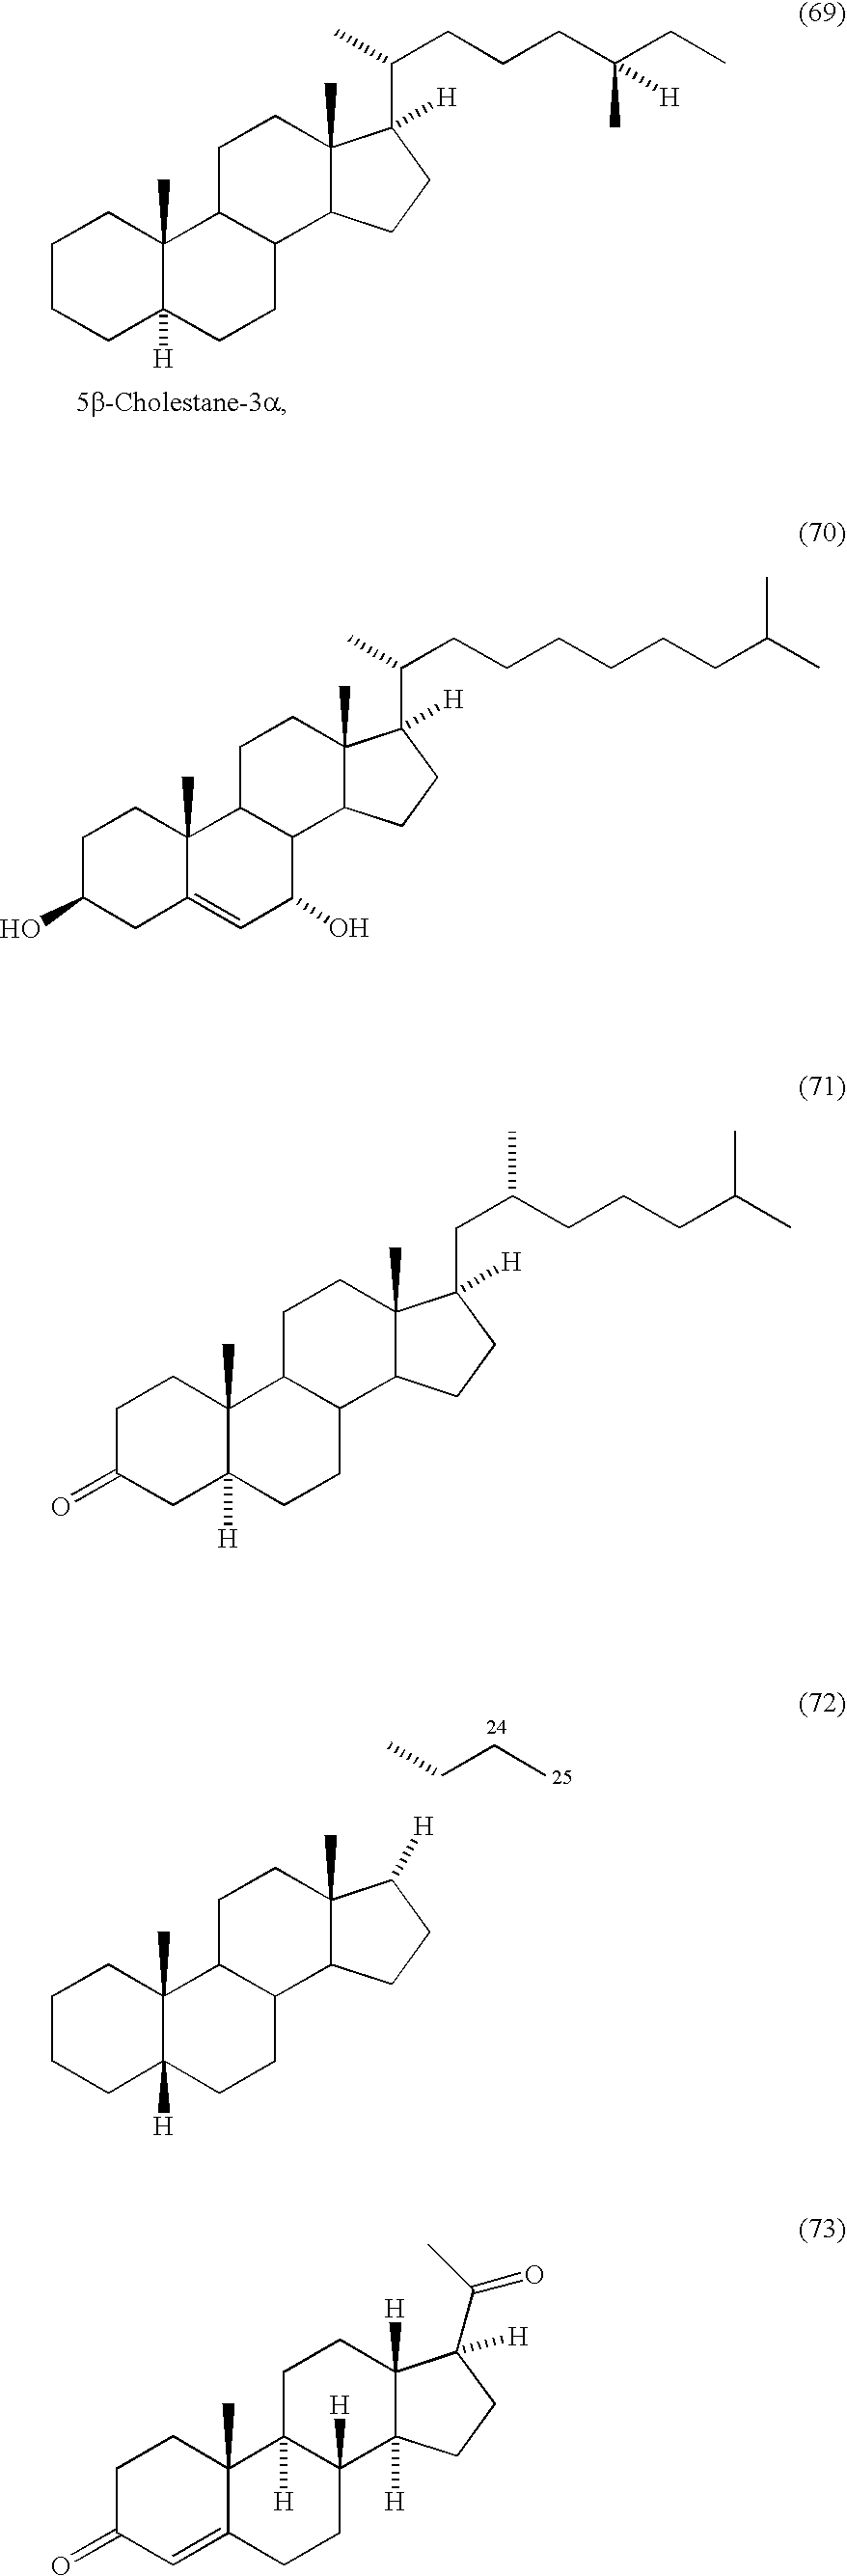 Us20080299220a1 Hydrophilic Non Aqueous Pharmaceutical Carriers Liquid Ring Vacuum Pump Diagram Closed Loop Butane Extraction System Figure 20081204 C00026